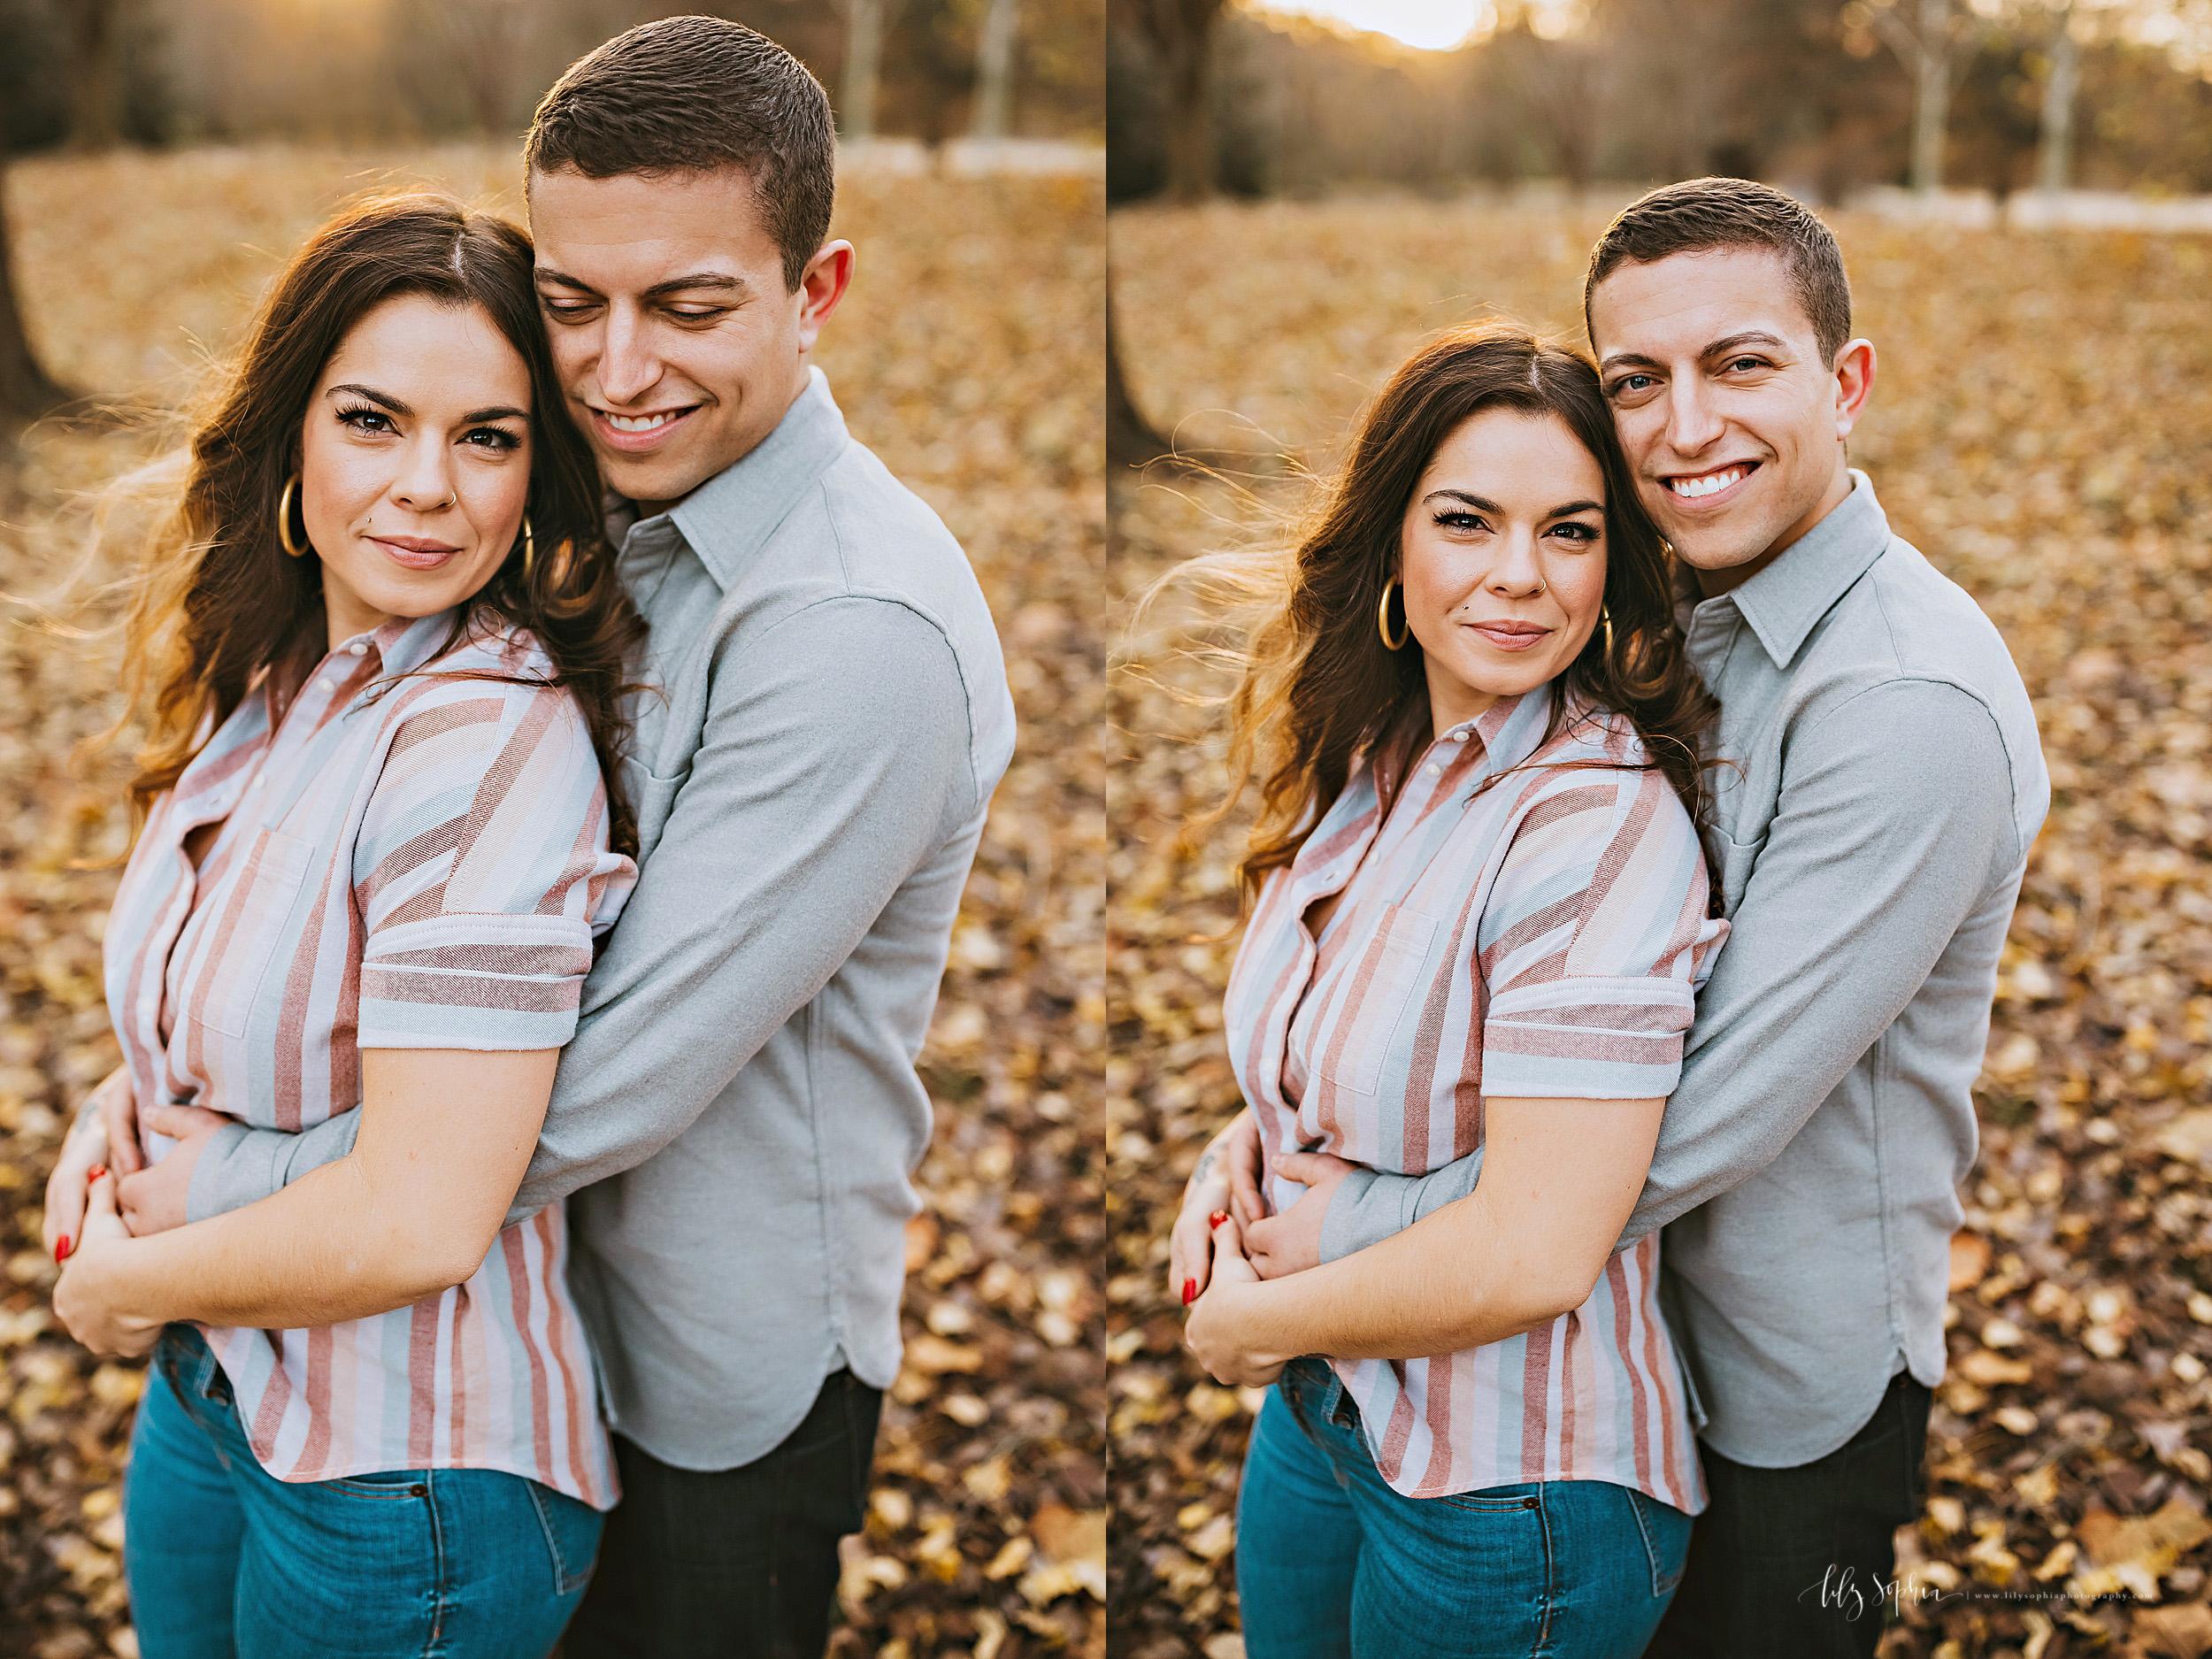 atlanta-reynoldstown-peoplestown-decatur-sandy-springs-buckhead-virginia-highlands-west-end-decatur-lily-sophia-photography-outdoor-fall-couples-photos_1490.jpg